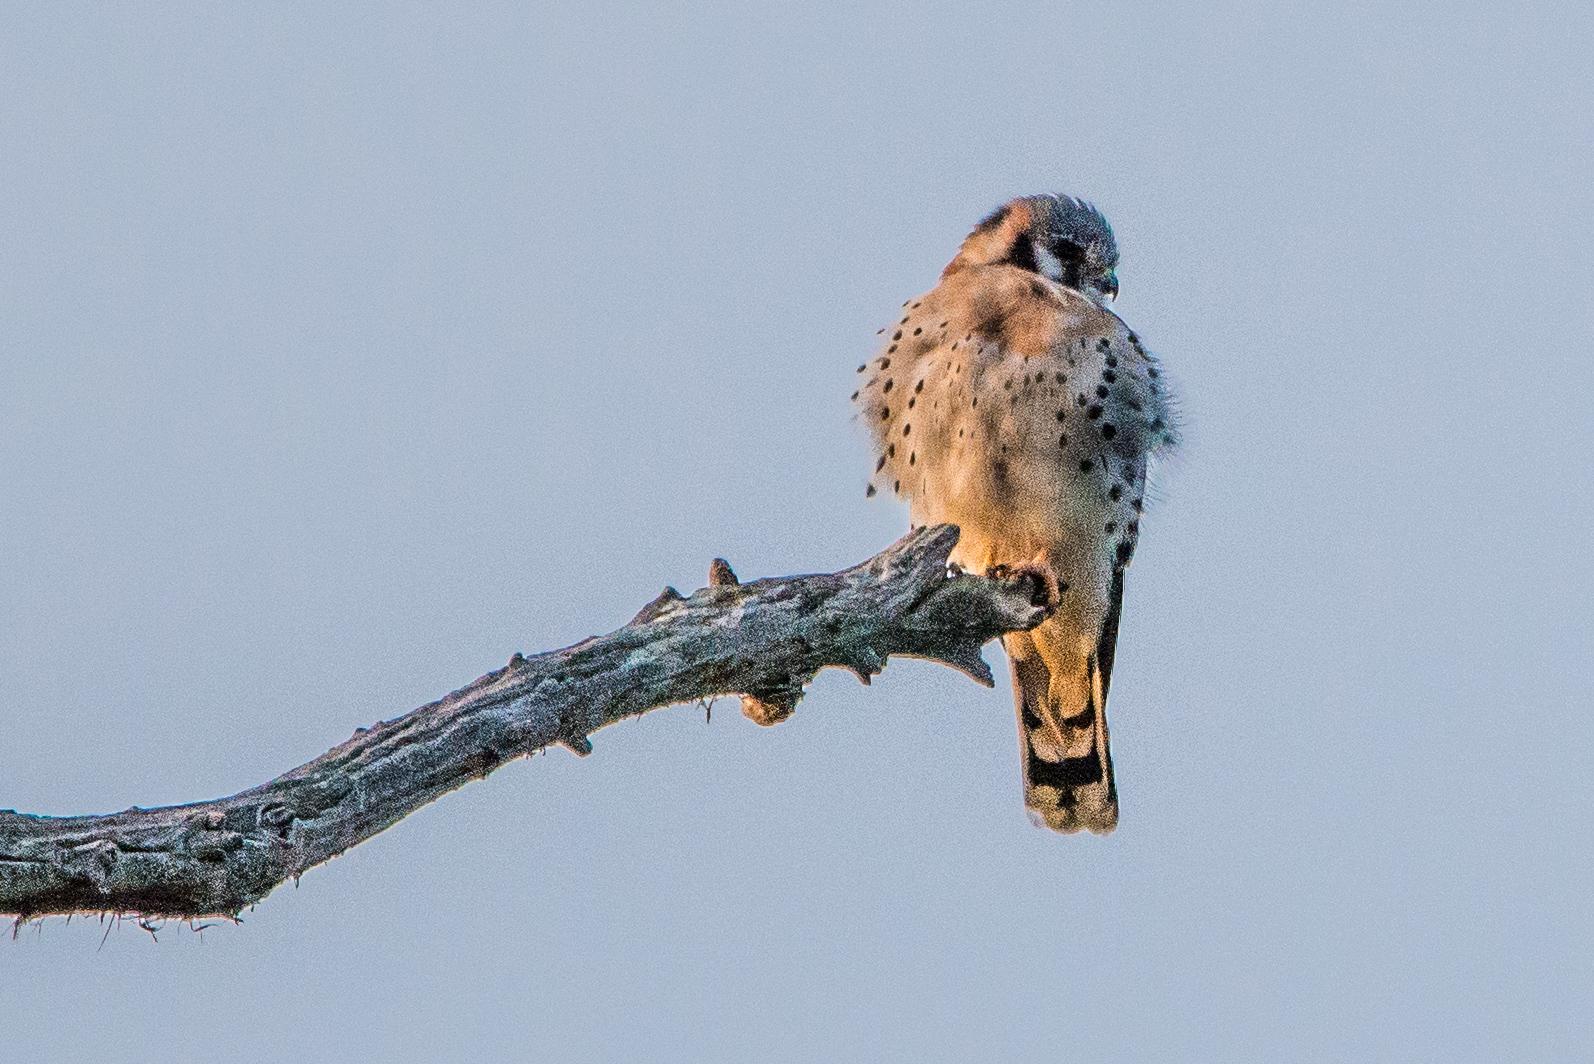 #kestrel, #bird, #wildlife, #photography, #birdphotography, #florida, #birdofprey, #spots